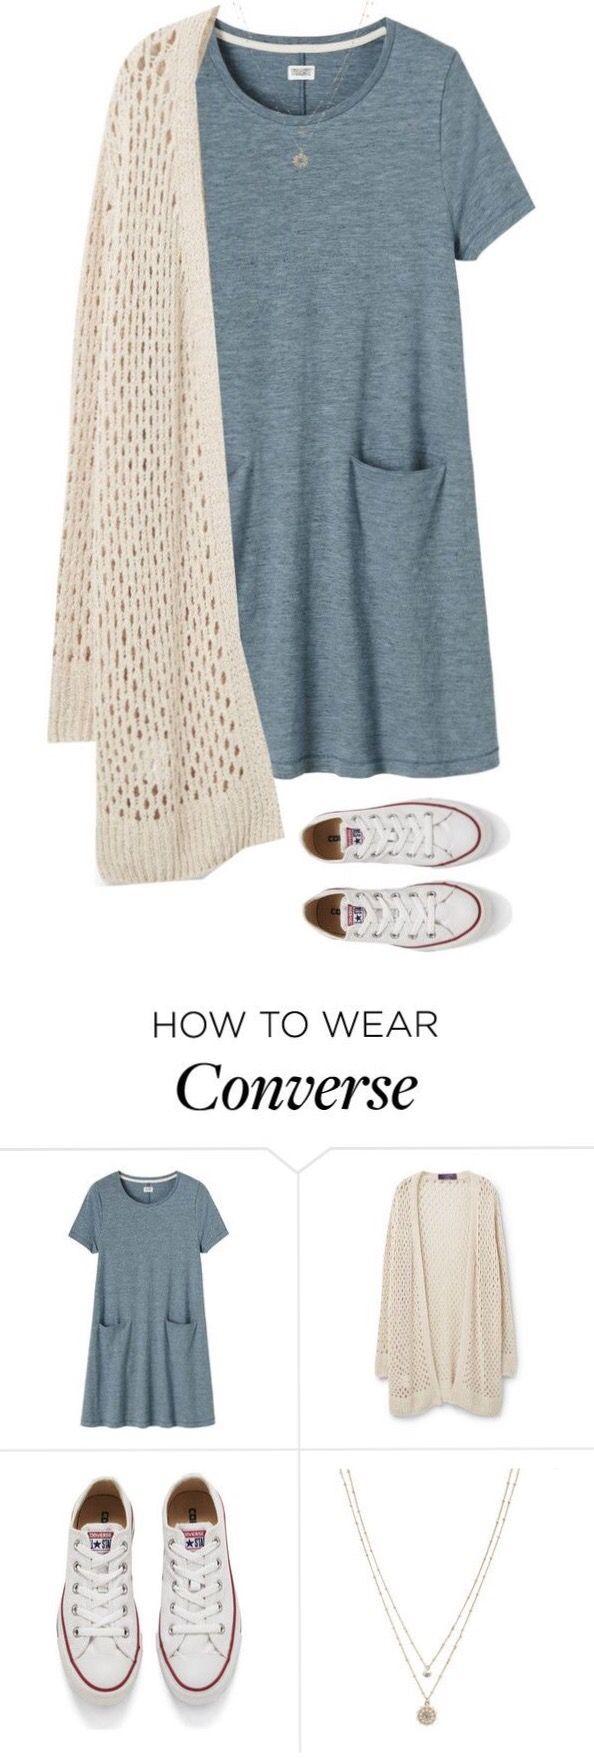 foto:pinterest  converse fashion outfit summer fashion lifestyle